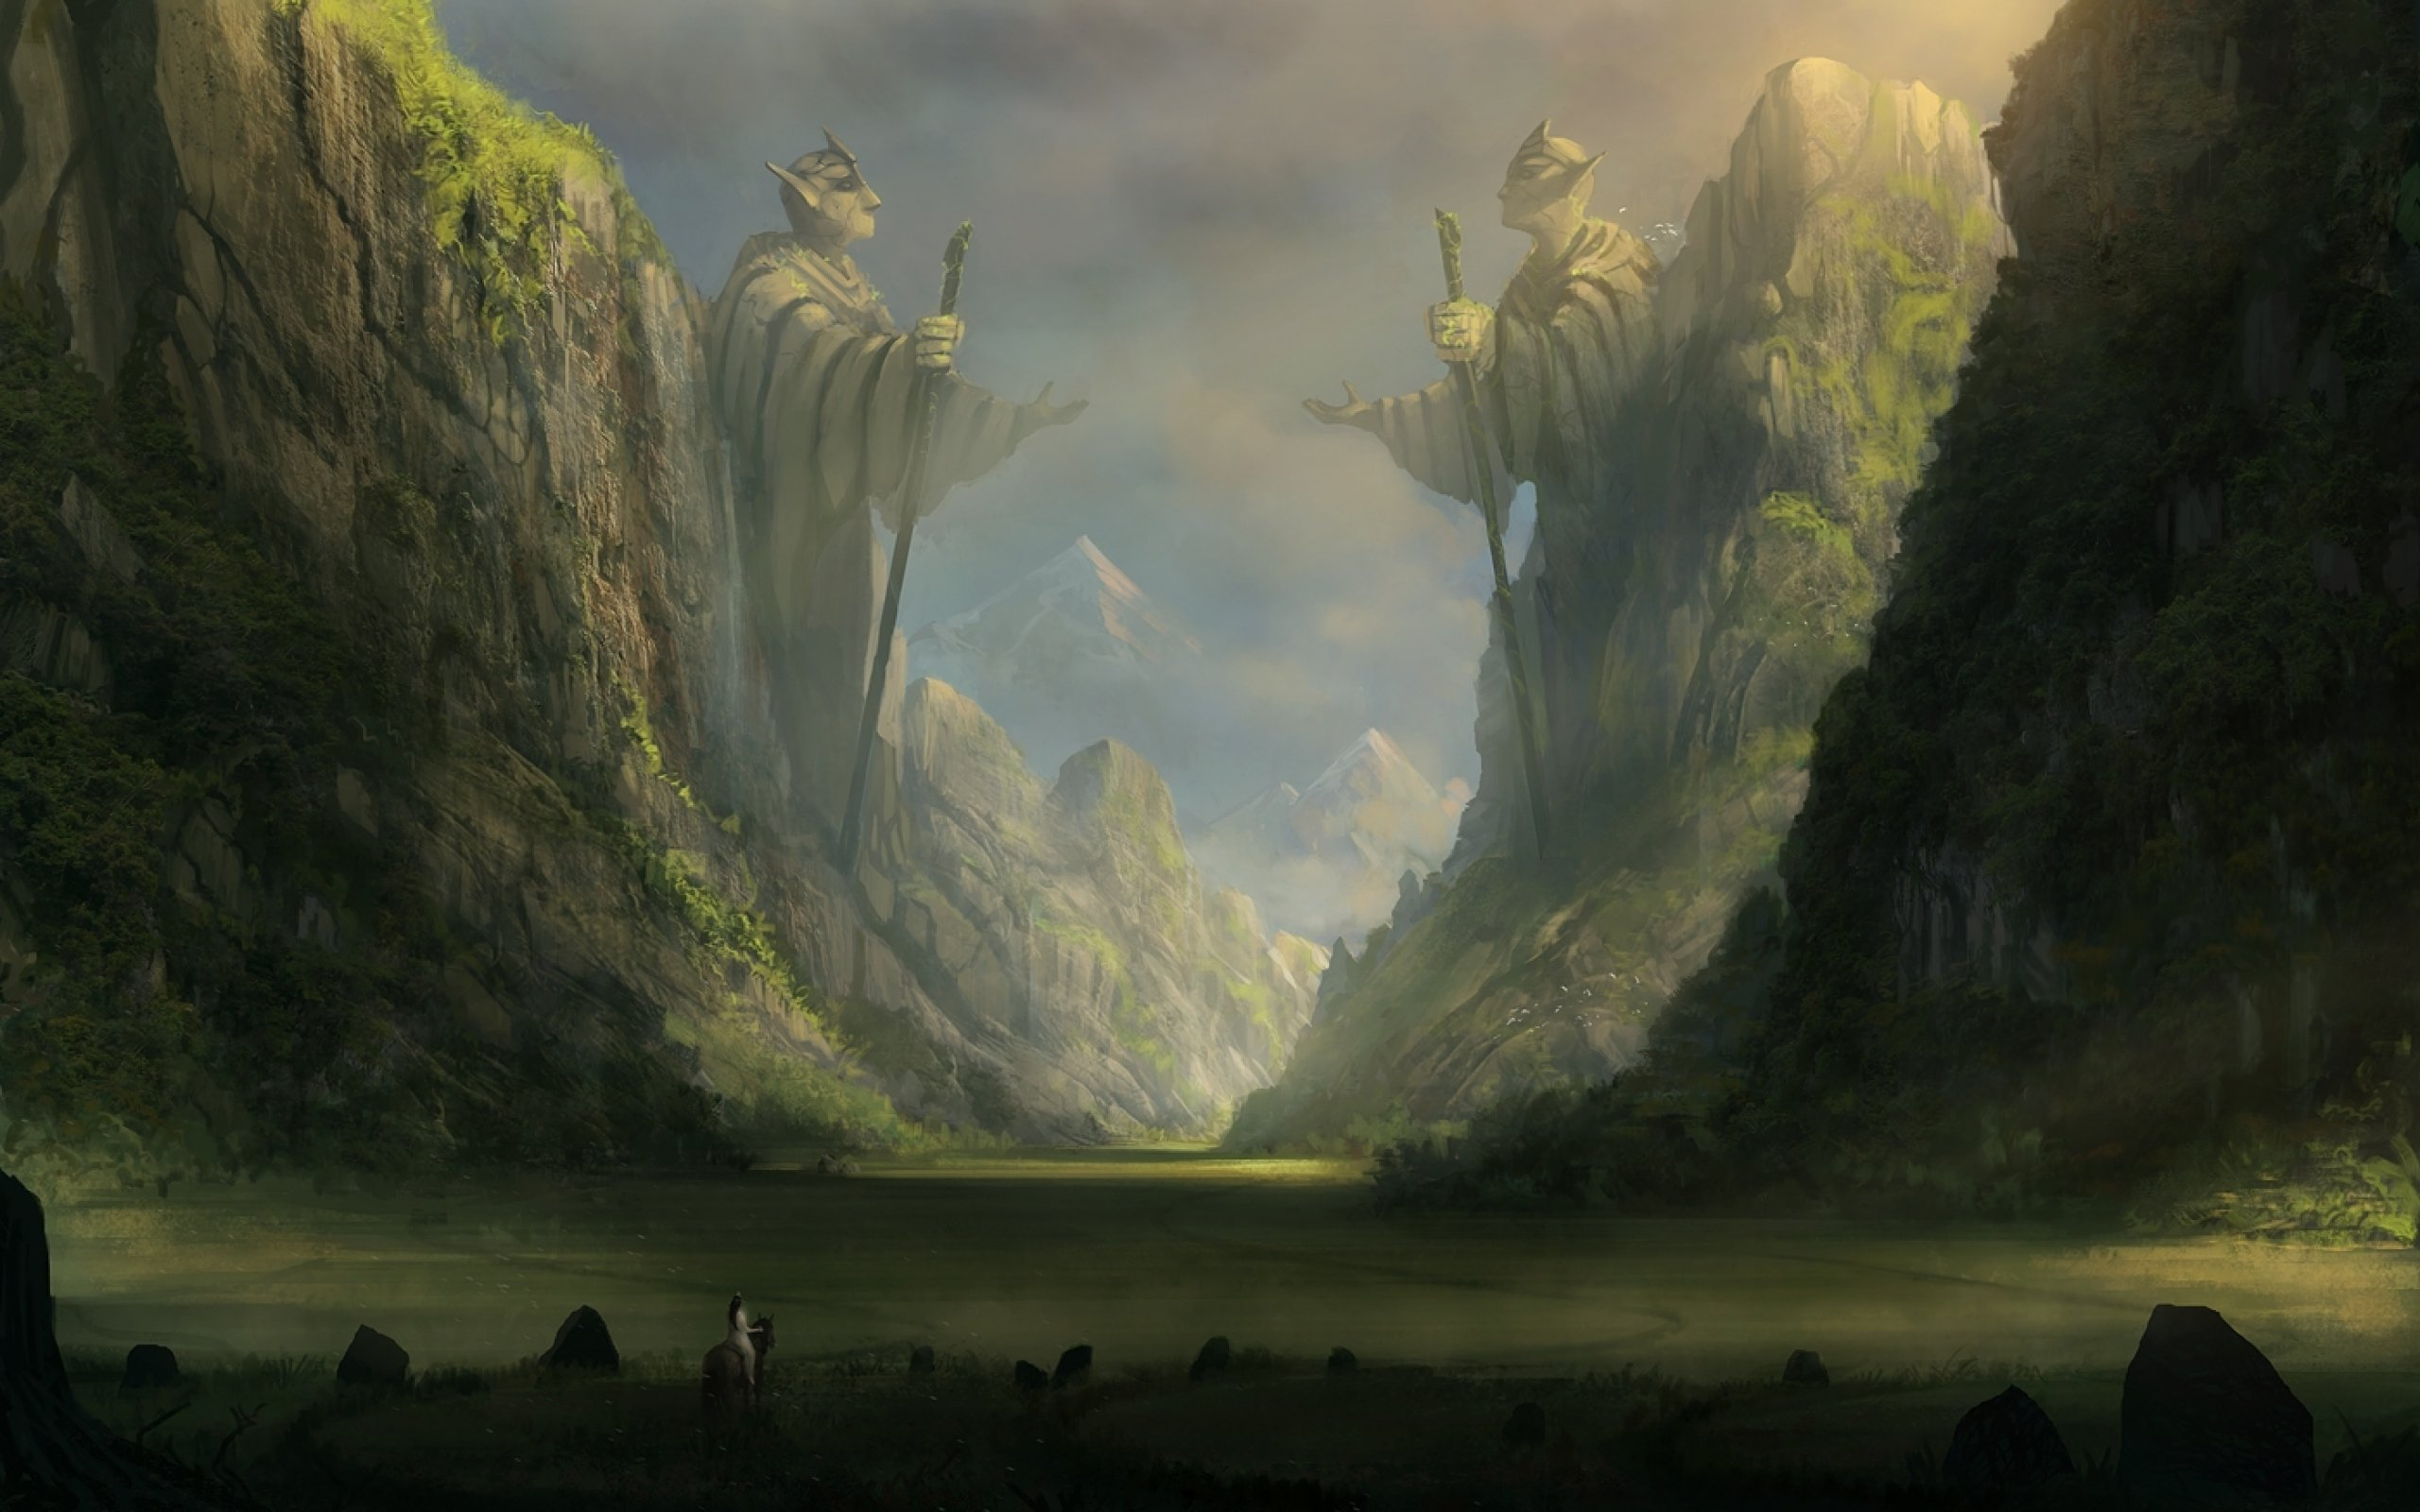 2560x1600 landscape drawing wallpaper - photo #3